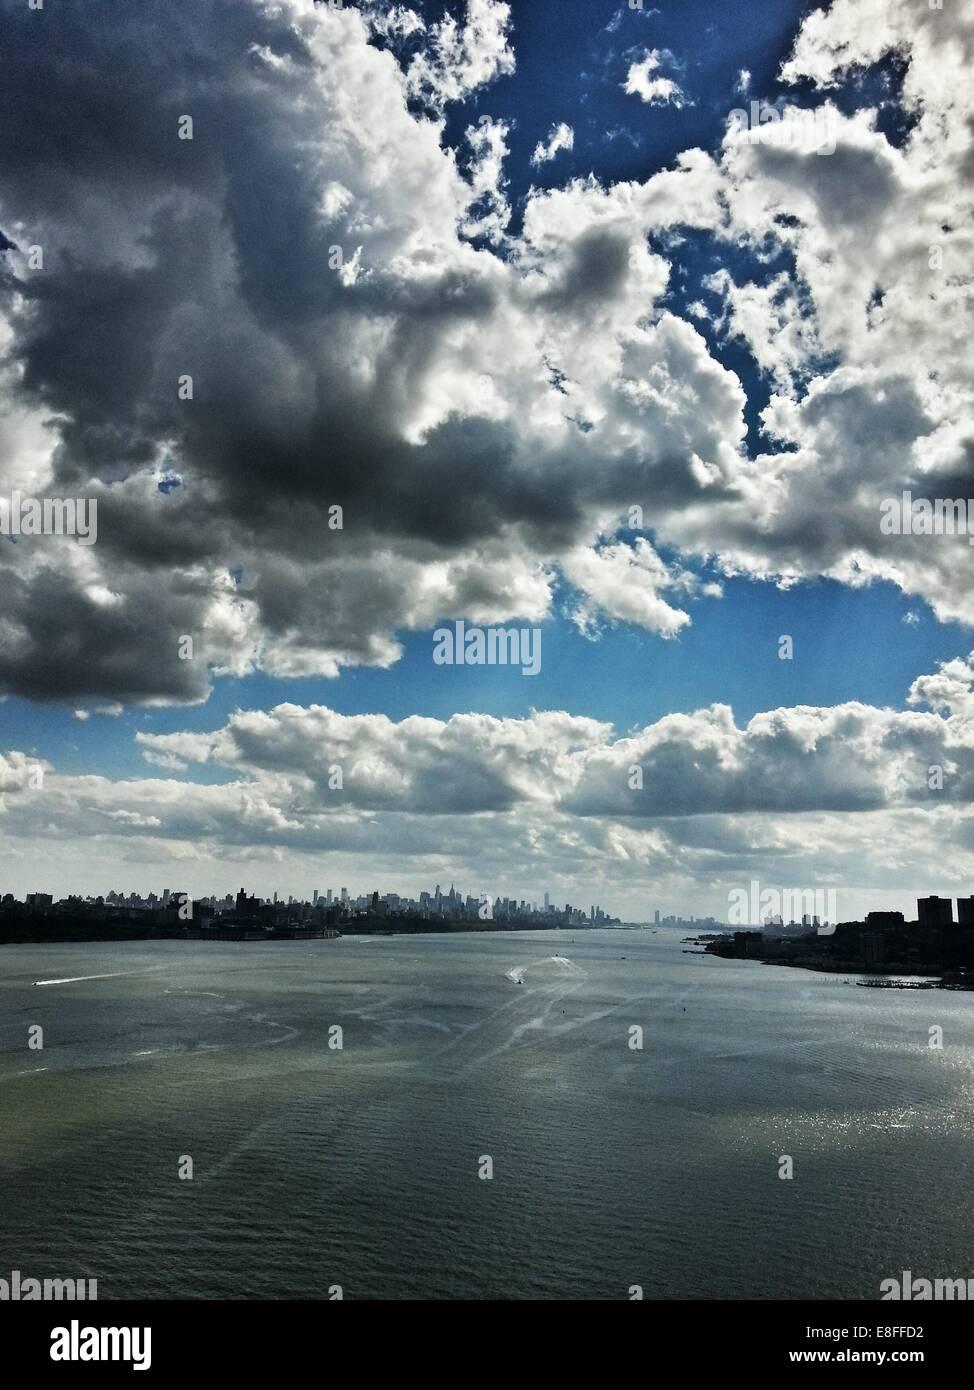 USA, New York State, New York City, Hudson River - Stock Image